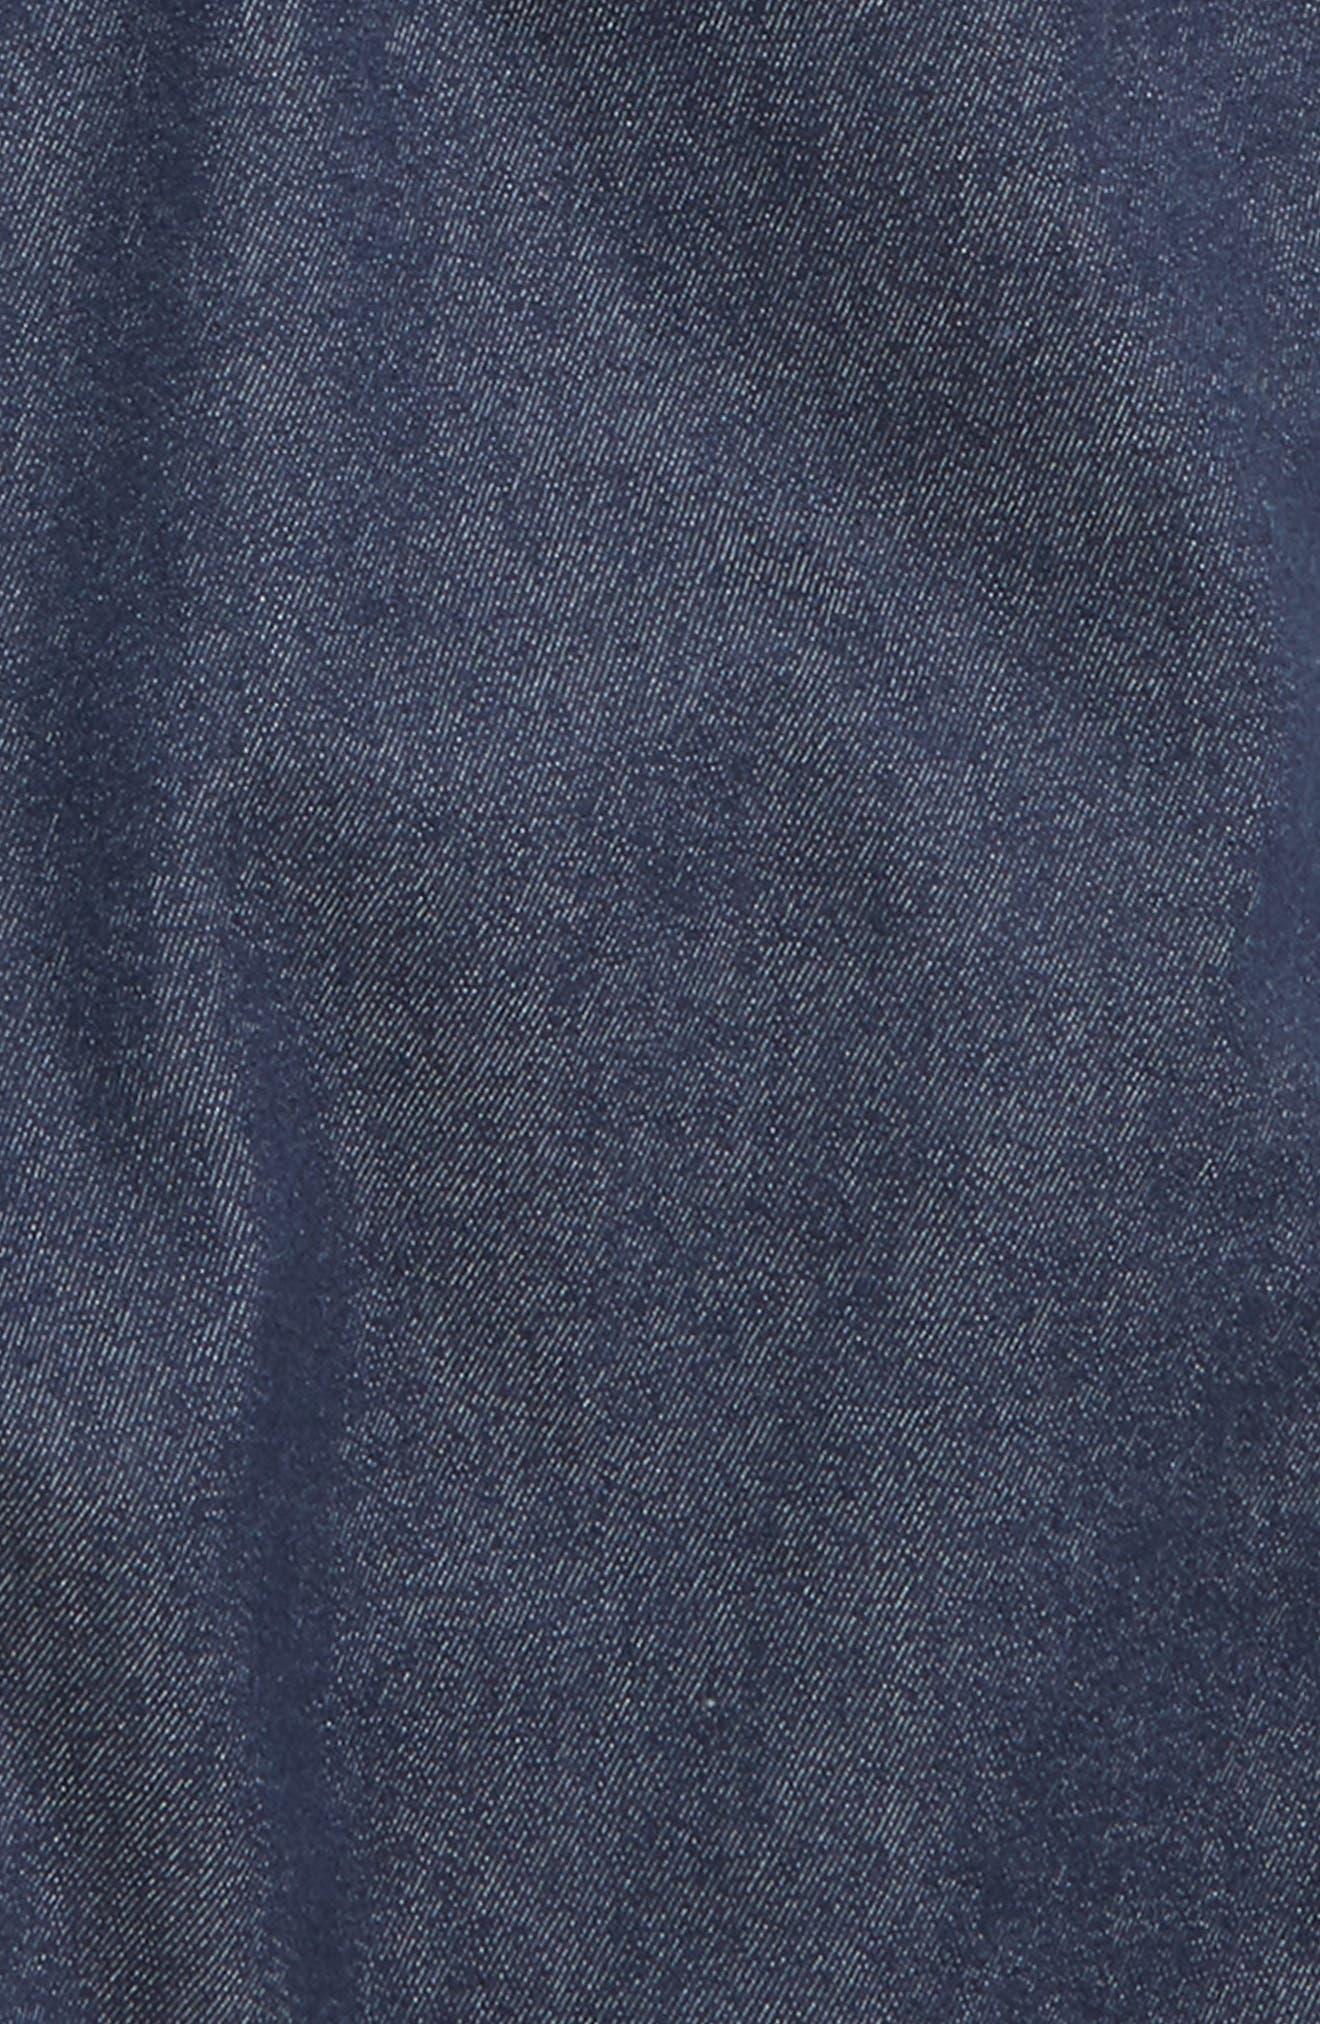 Twill Shorts,                             Alternate thumbnail 3, color,                             Navy Indigo